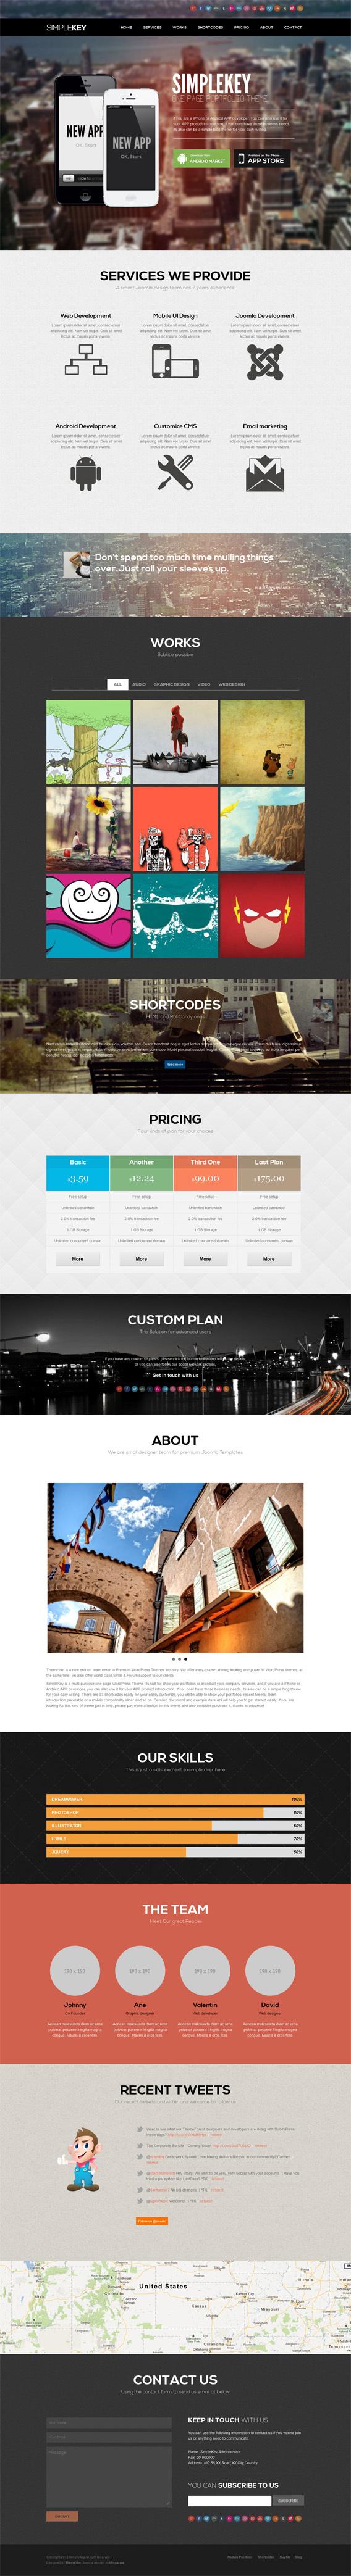 SimpleKey Joomla e Page Creative Portfolio Template on Behance